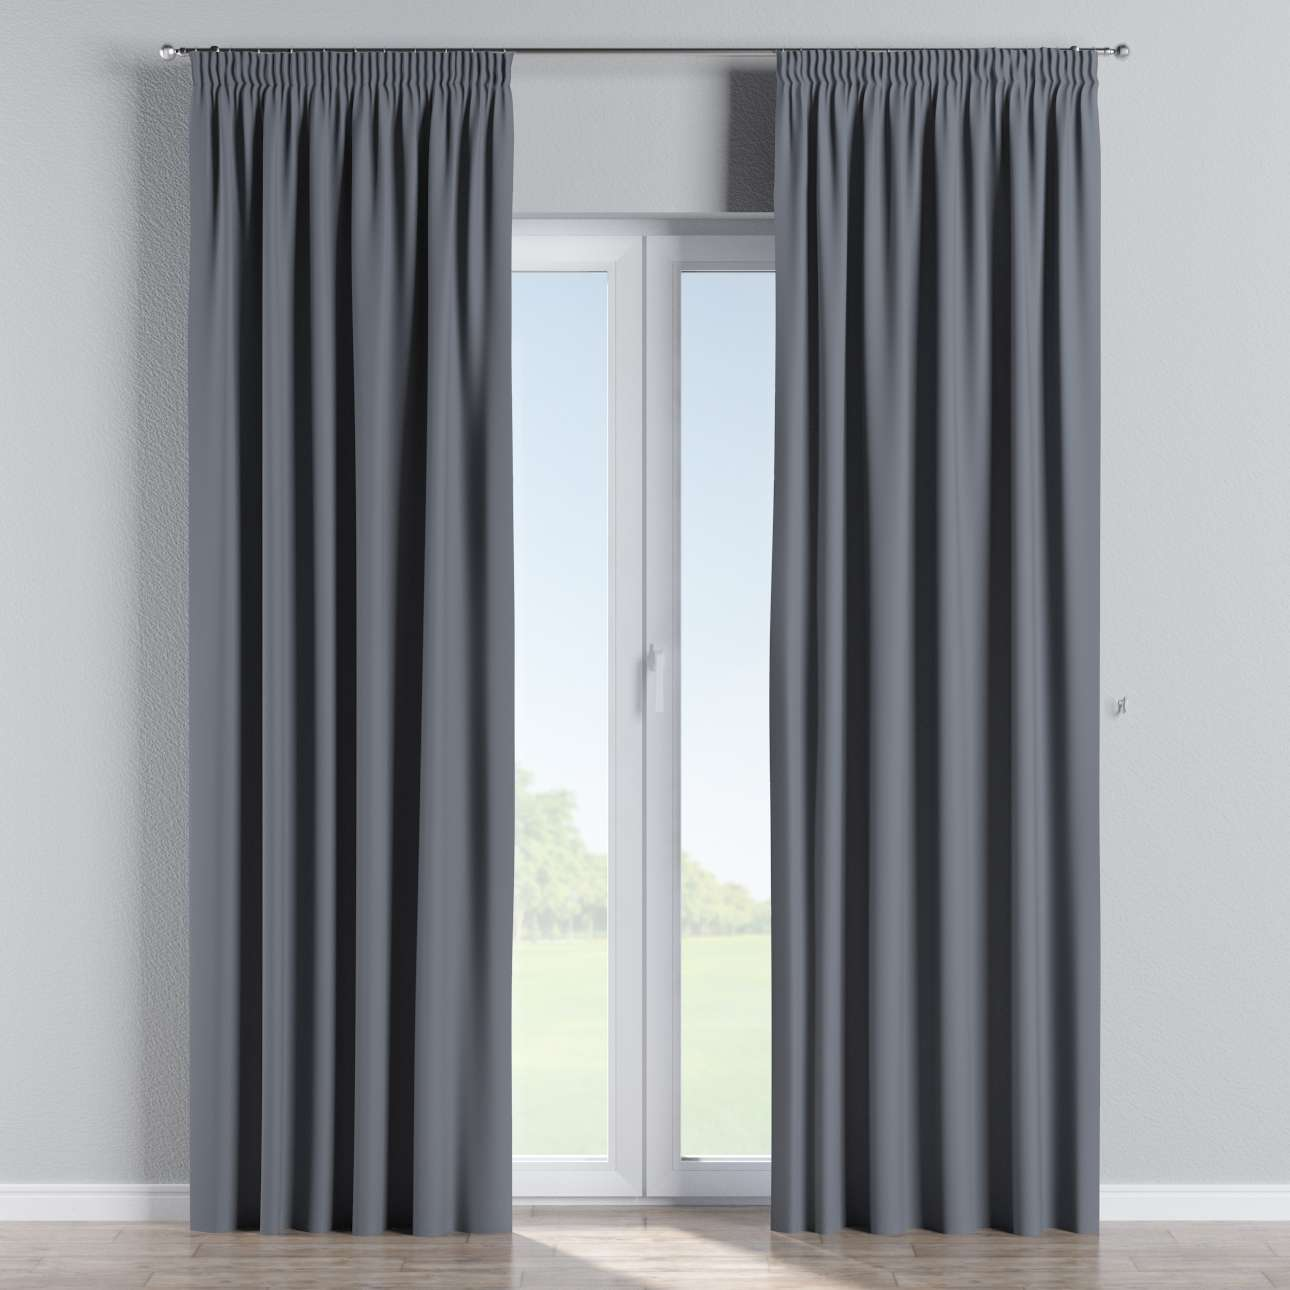 verdunklungsvorhang mit kr uselband dunkelgrau dekoria. Black Bedroom Furniture Sets. Home Design Ideas